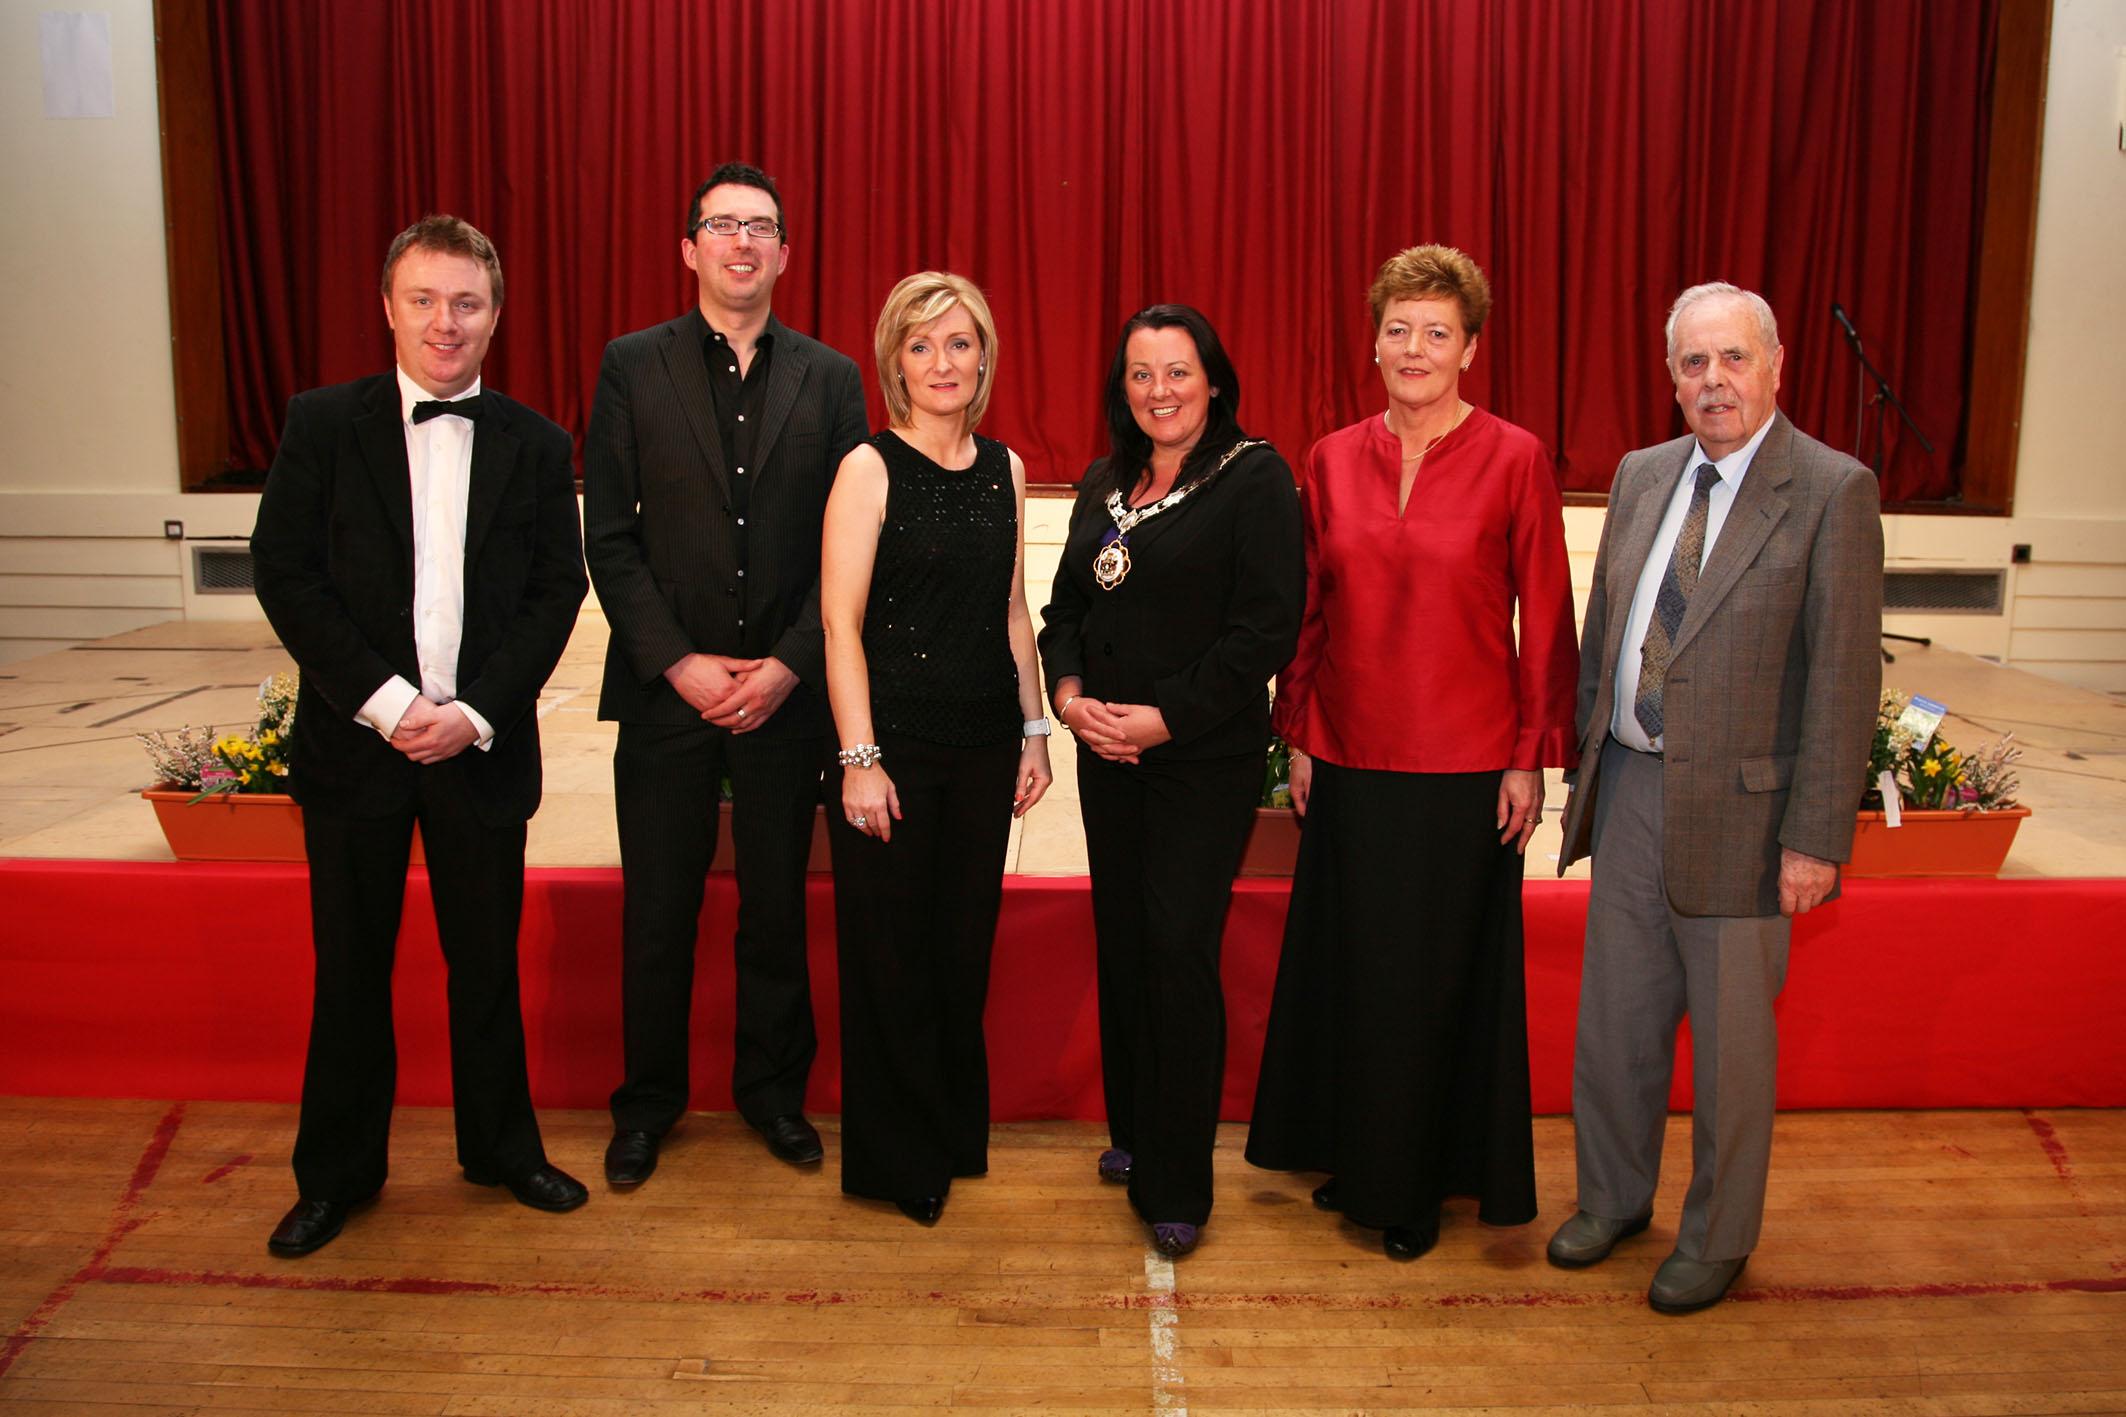 Left to Right; Richard Yarr - Compere, Darren Baird - Accompanist, Sheelagh Greer - Director of Music, Paula Bradley - Mayor of Newtownabbey Borough Council, Barbara Lowry - Choir Chairperson & Mr GCG Millar - Choir President